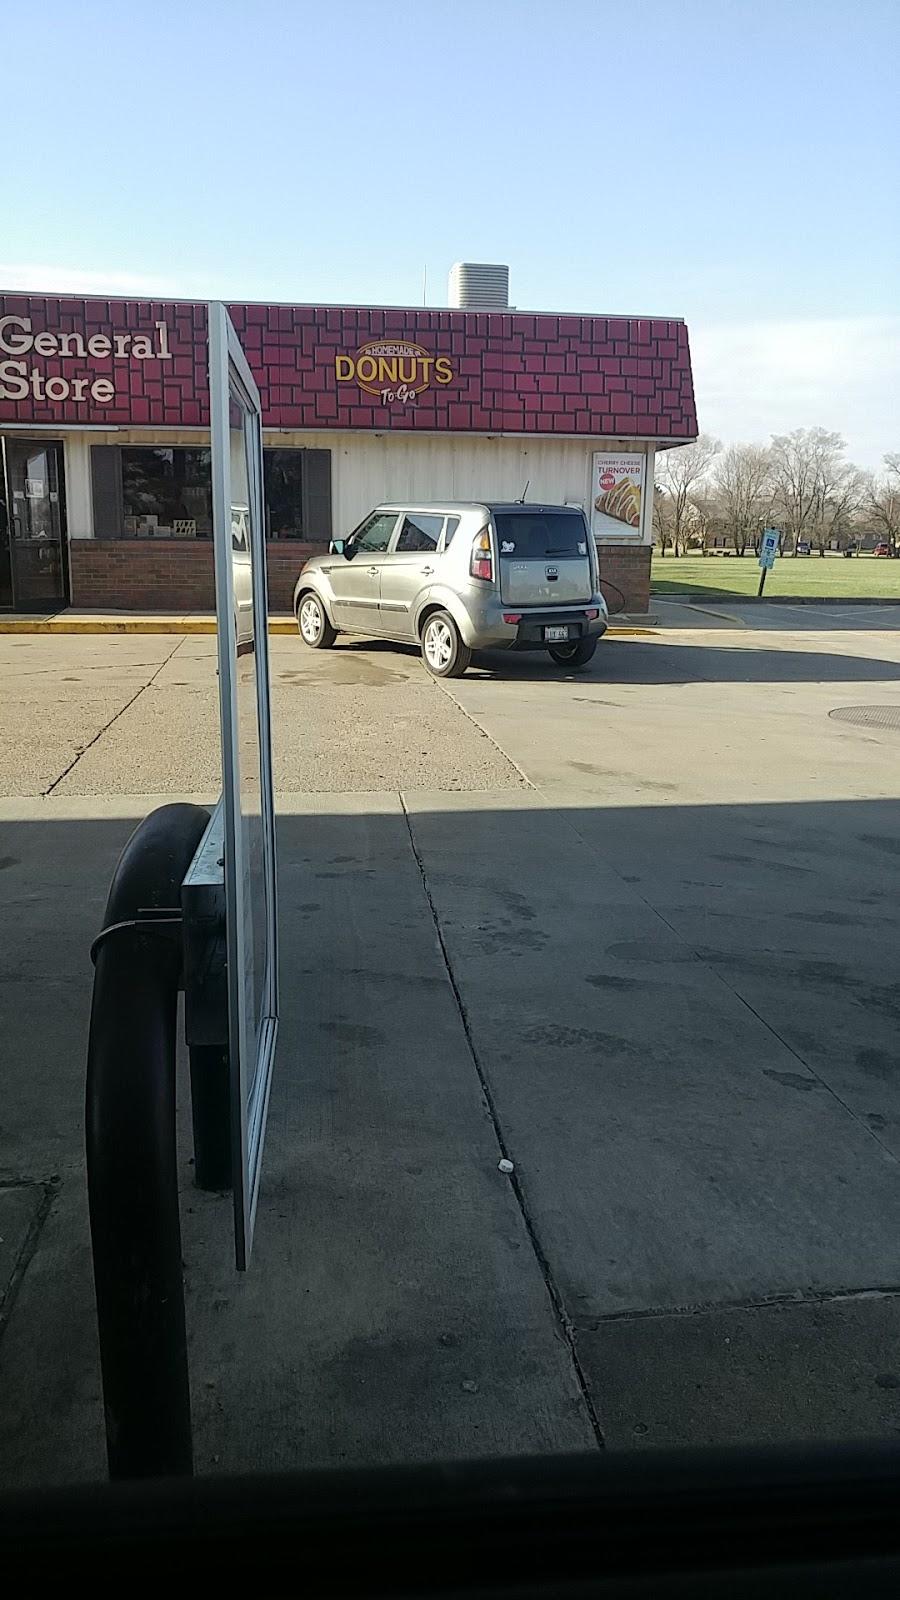 Caseys | convenience store | 1206 W Truitt Ave, Chillicothe, IL 61523, USA | 3092742612 OR +1 309-274-2612